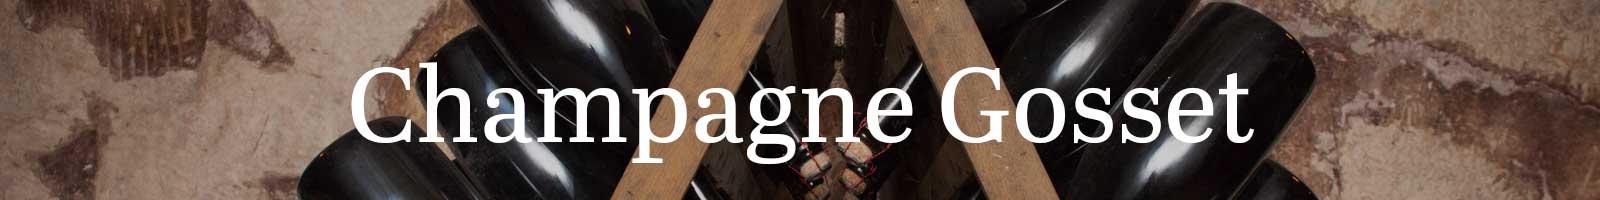 Essential Winemaker of France: Champagne Gosset